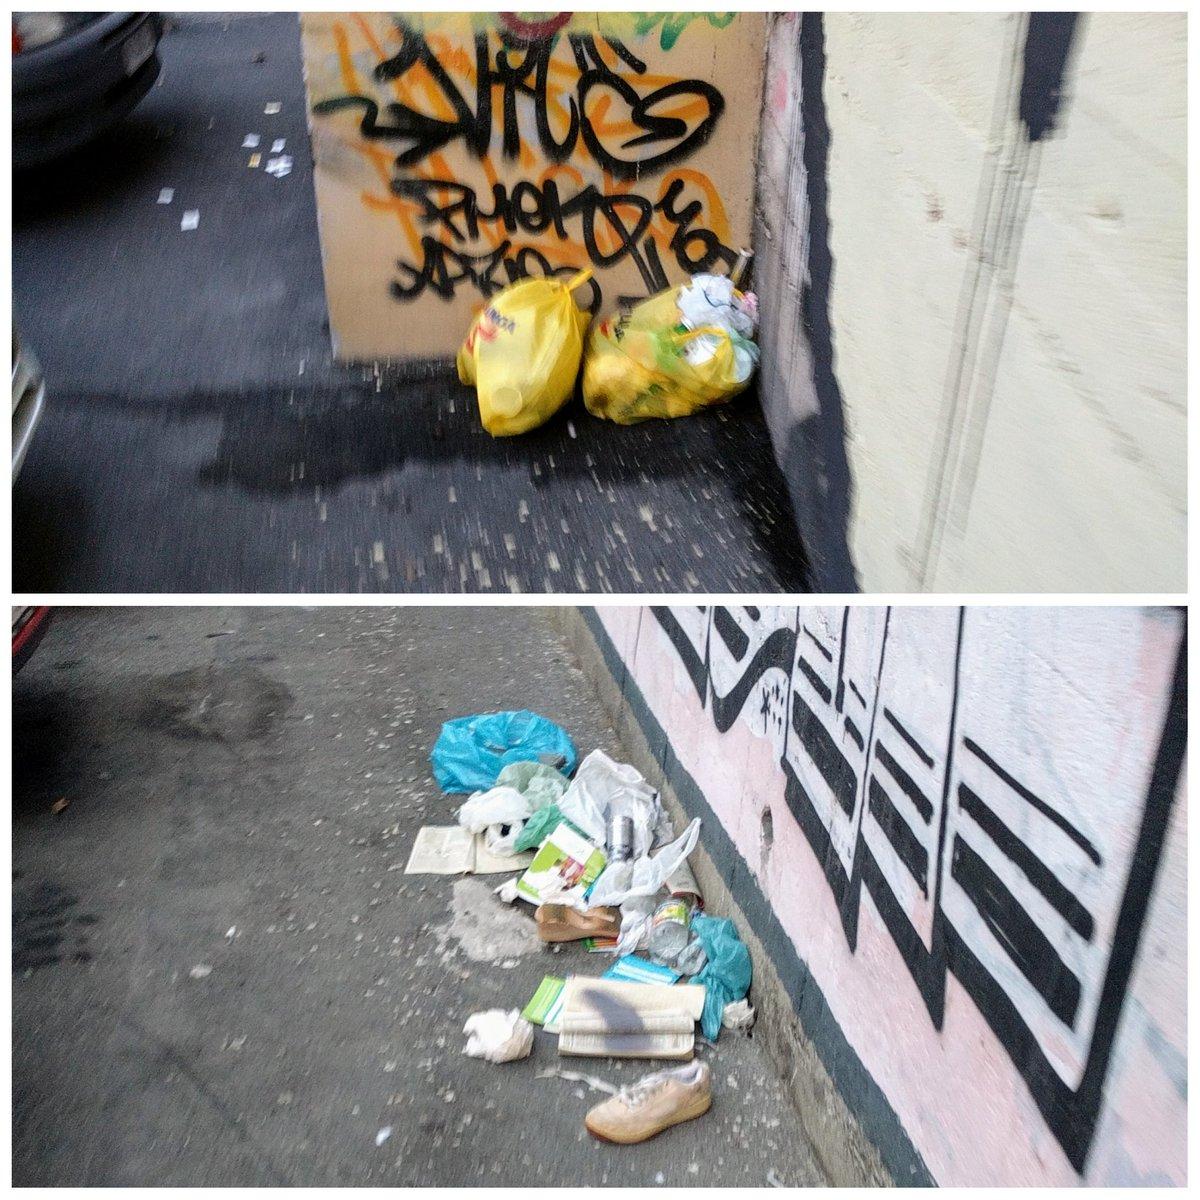 @amsa_spa @InciviliaMilano #rifiuti #incivili #Milano via Plezzo quasi angolo via Pordenone  - Ukustom